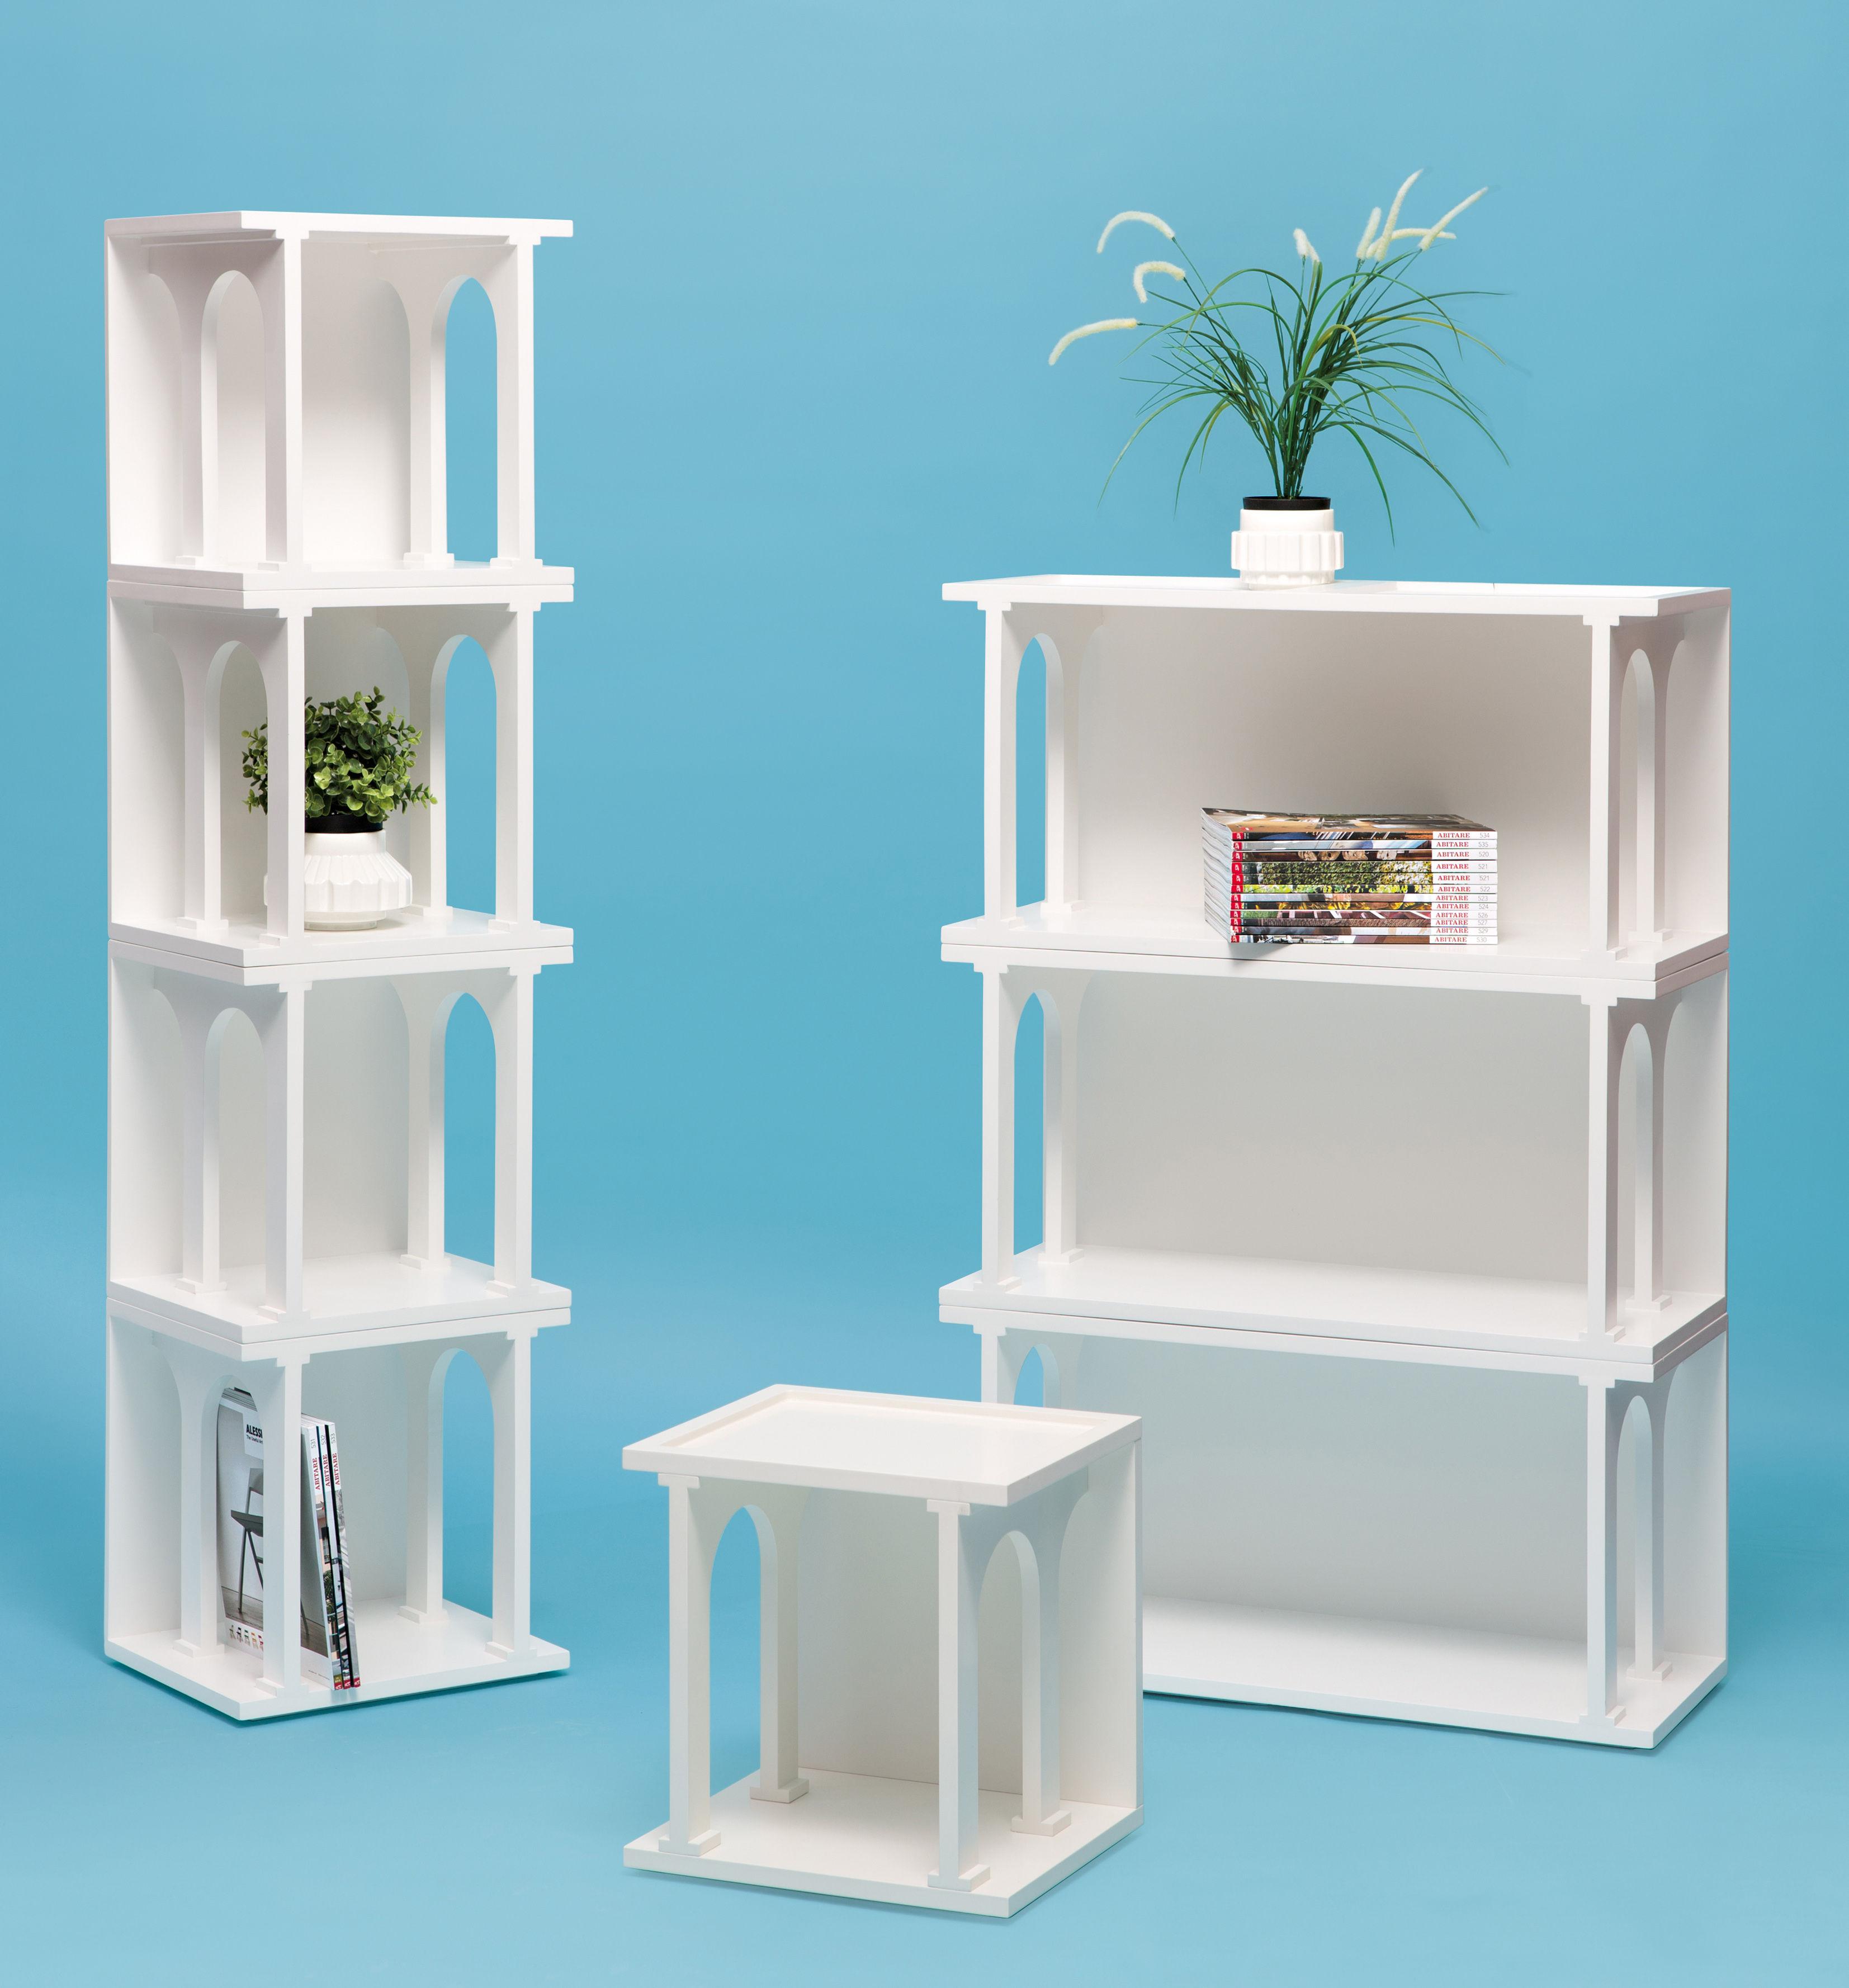 etag re renaissance 40 x 40 cm blanc mat seletti. Black Bedroom Furniture Sets. Home Design Ideas